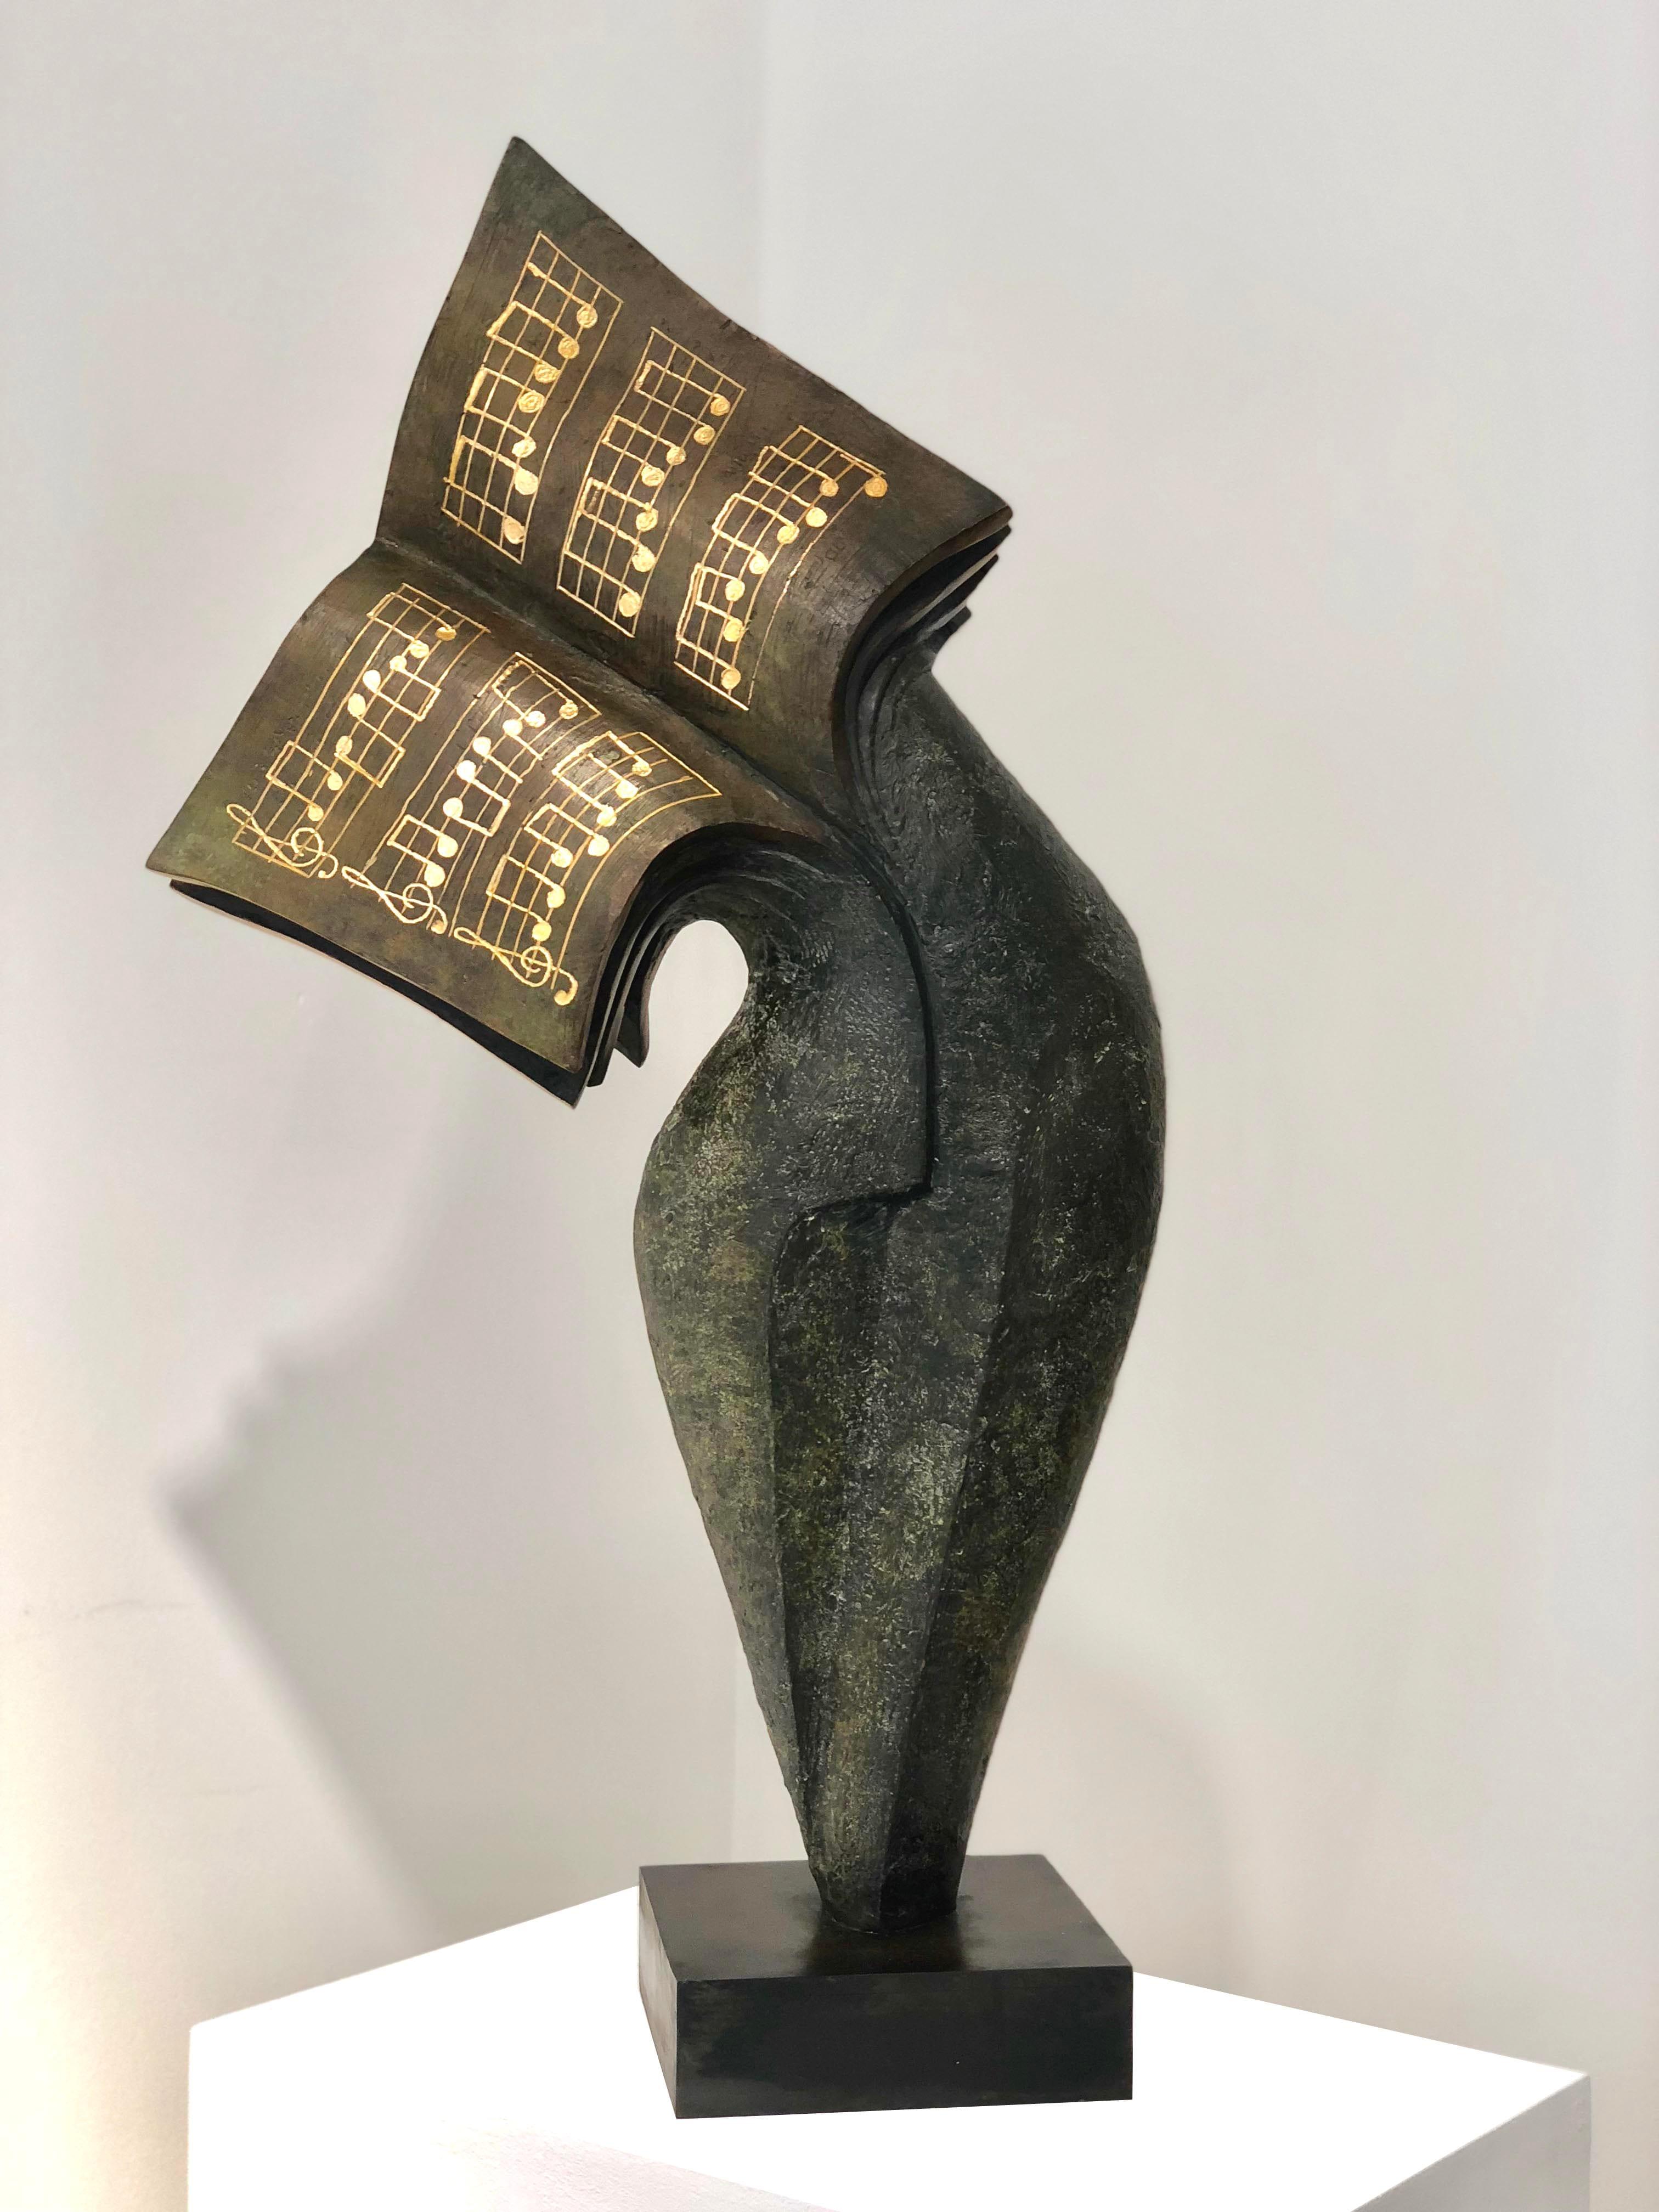 THALIA Bronze 88x52x20cm / 34,6x20,4x7,8 inches